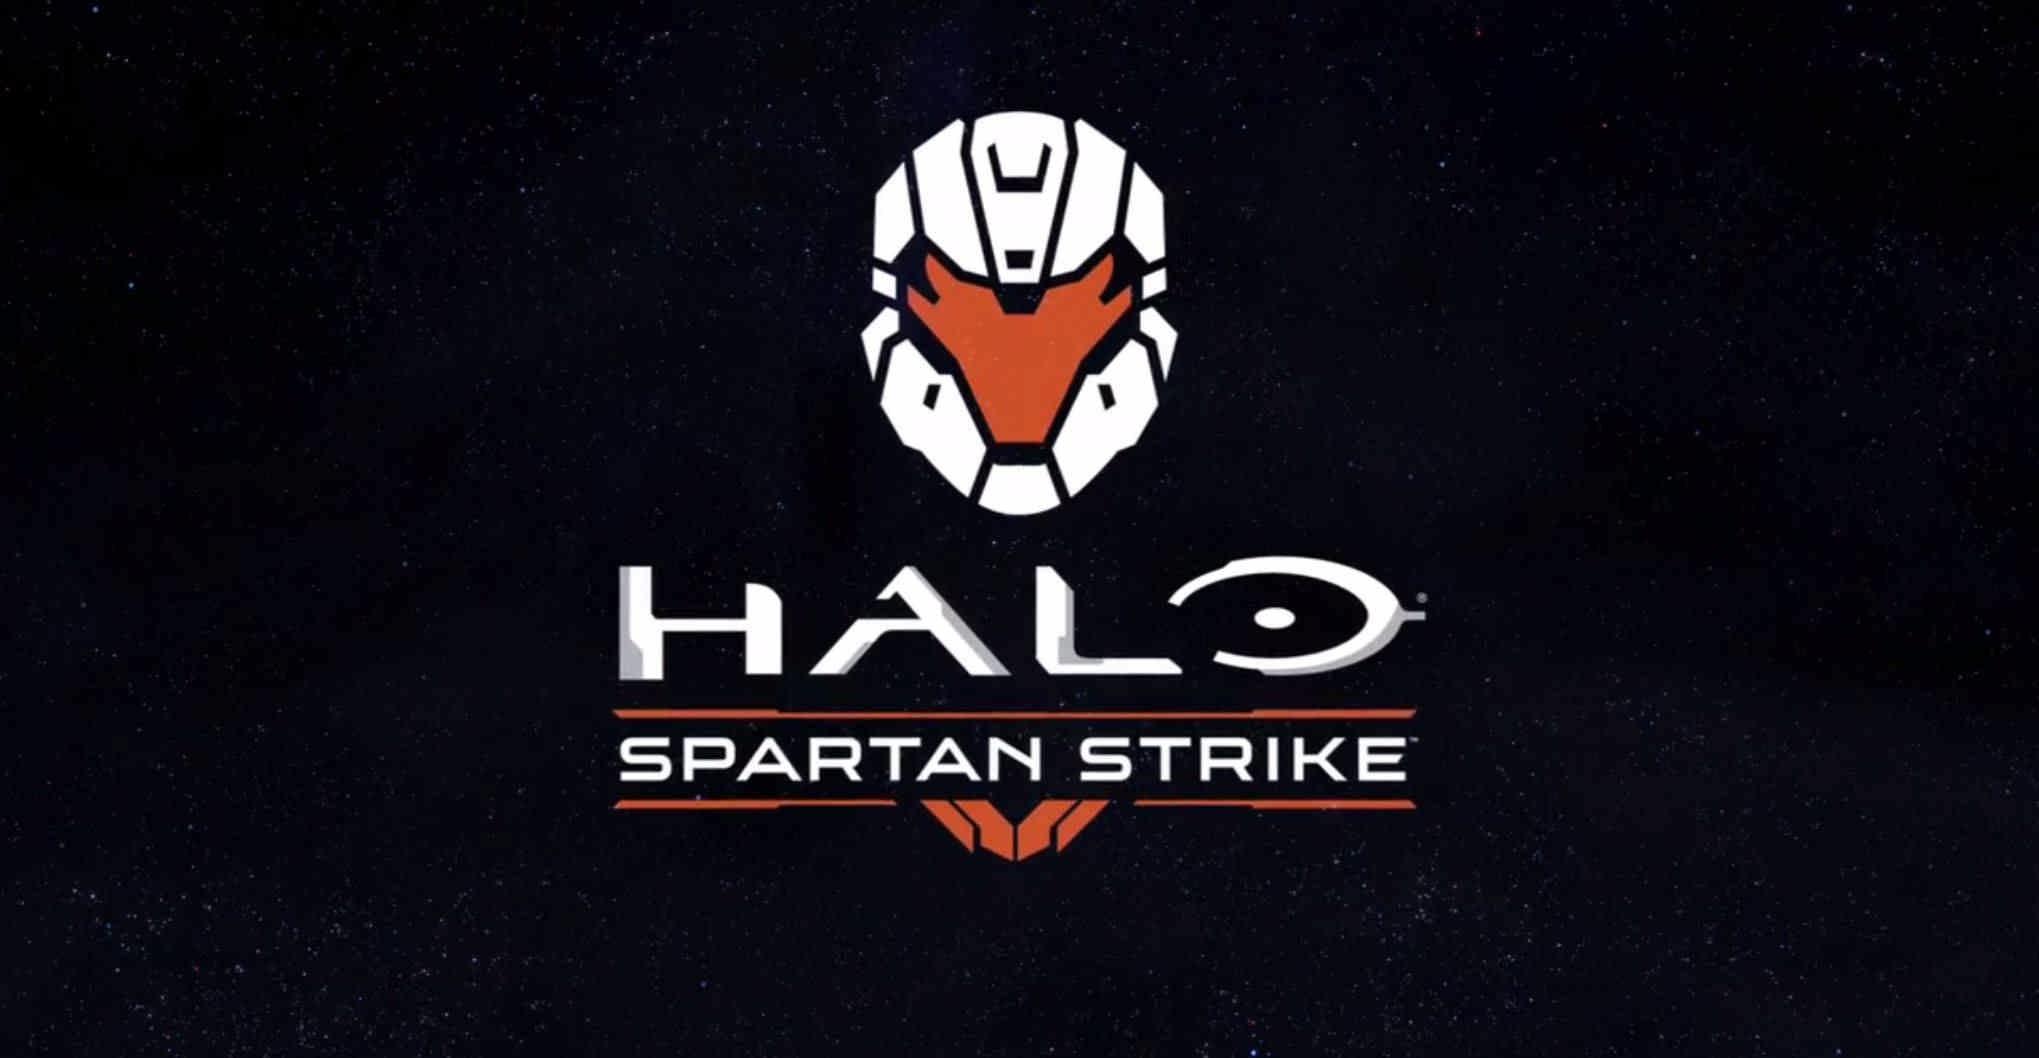 Halo-Spartan-Strike